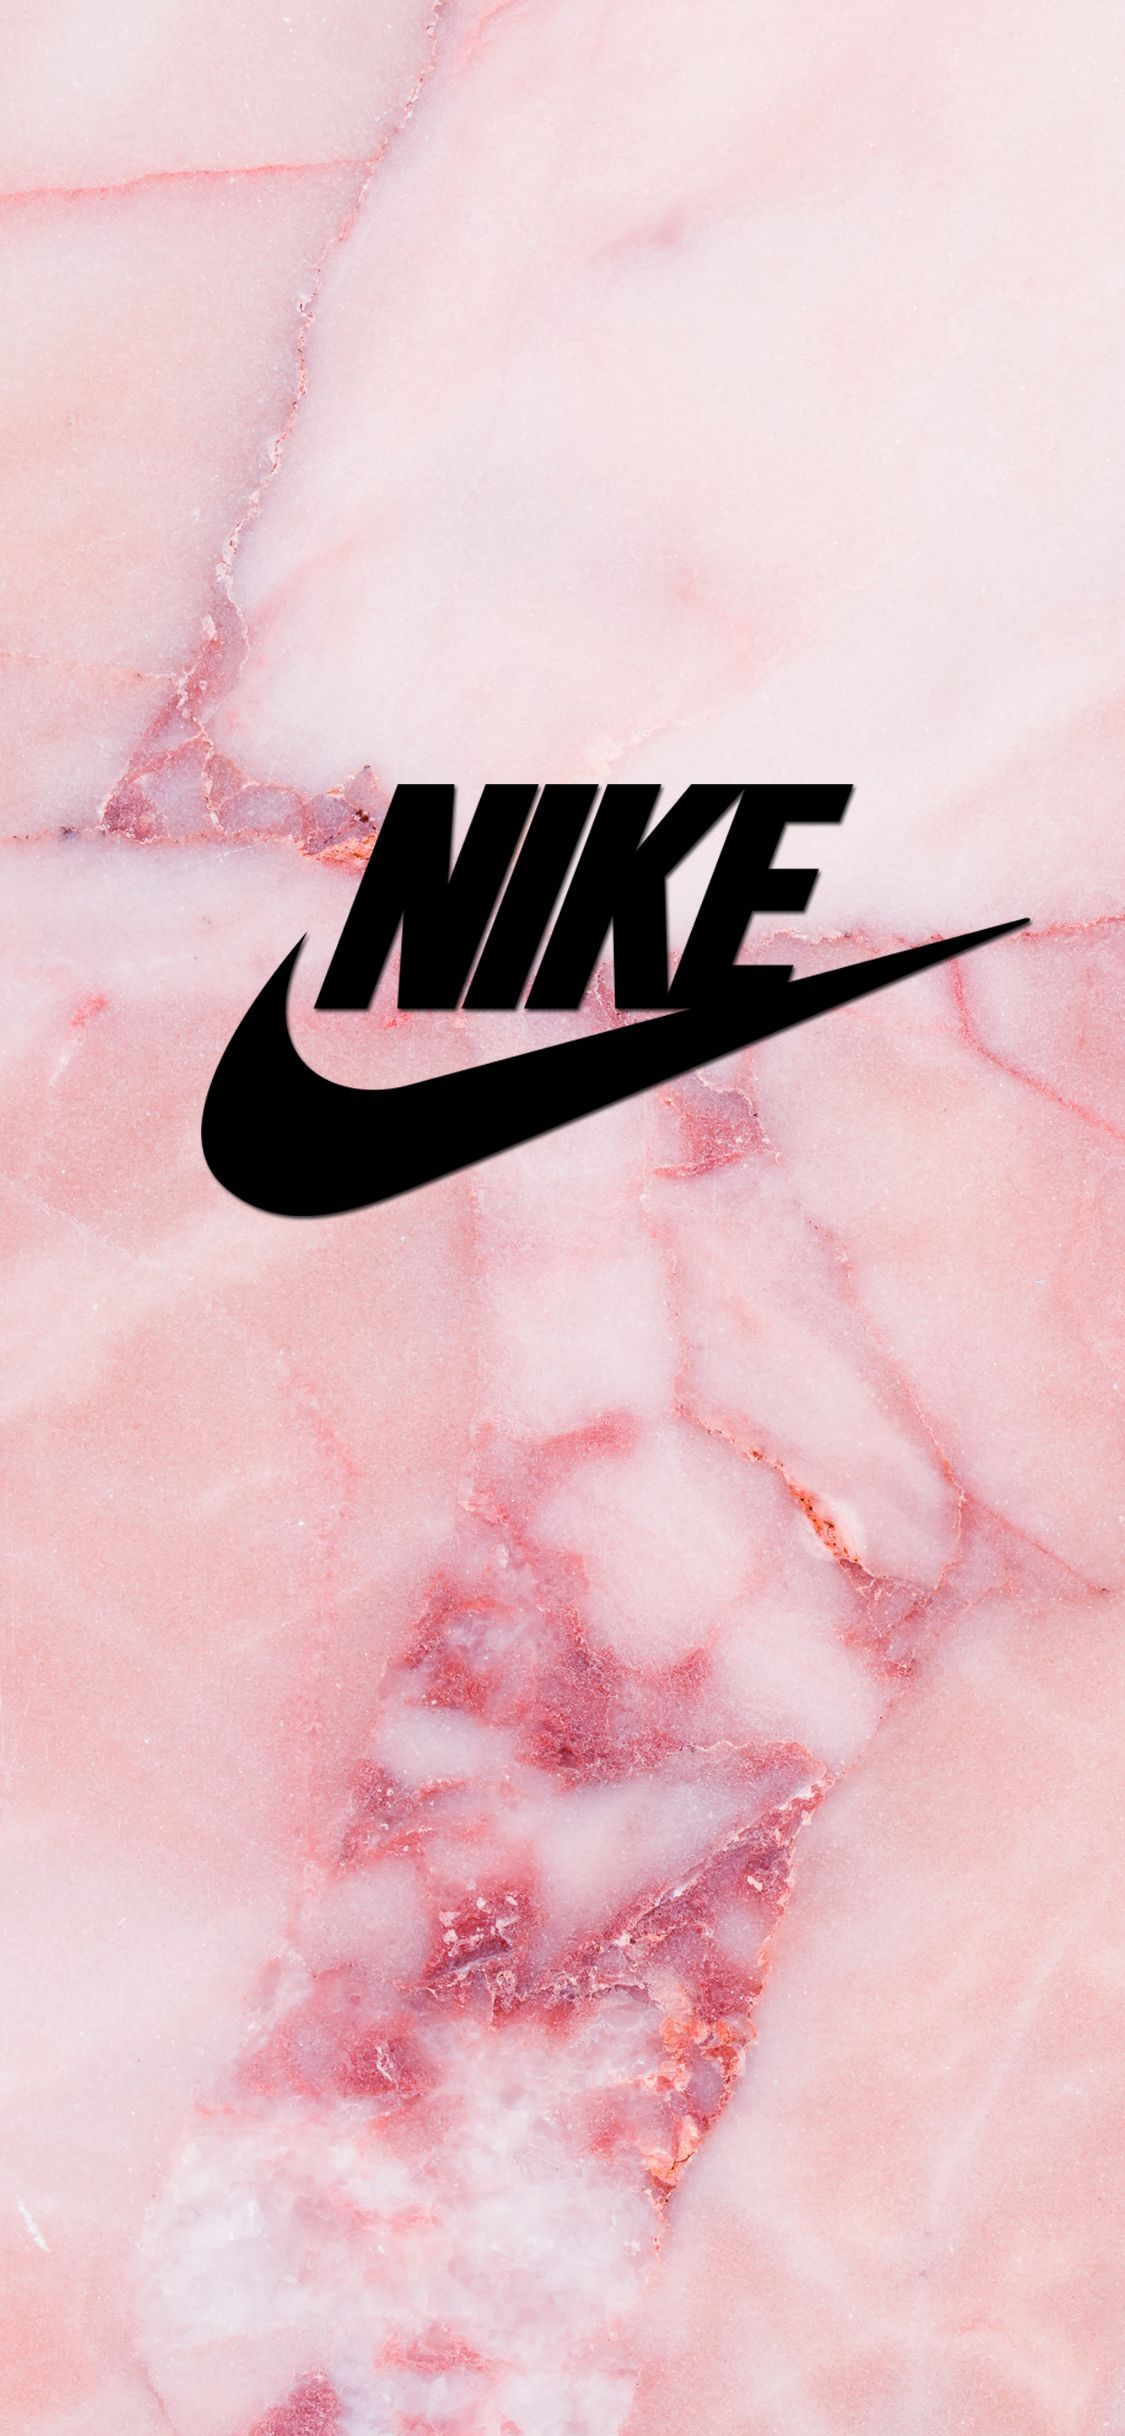 Inspirado En Rose Funda Nike Iphone 7 Plus Iphone X Funda Marmol Iphone 8 Plus Funda Nike Iph Nike Wallpaper Iphone Pink Nike Wallpaper Nike Logo Wallpapers